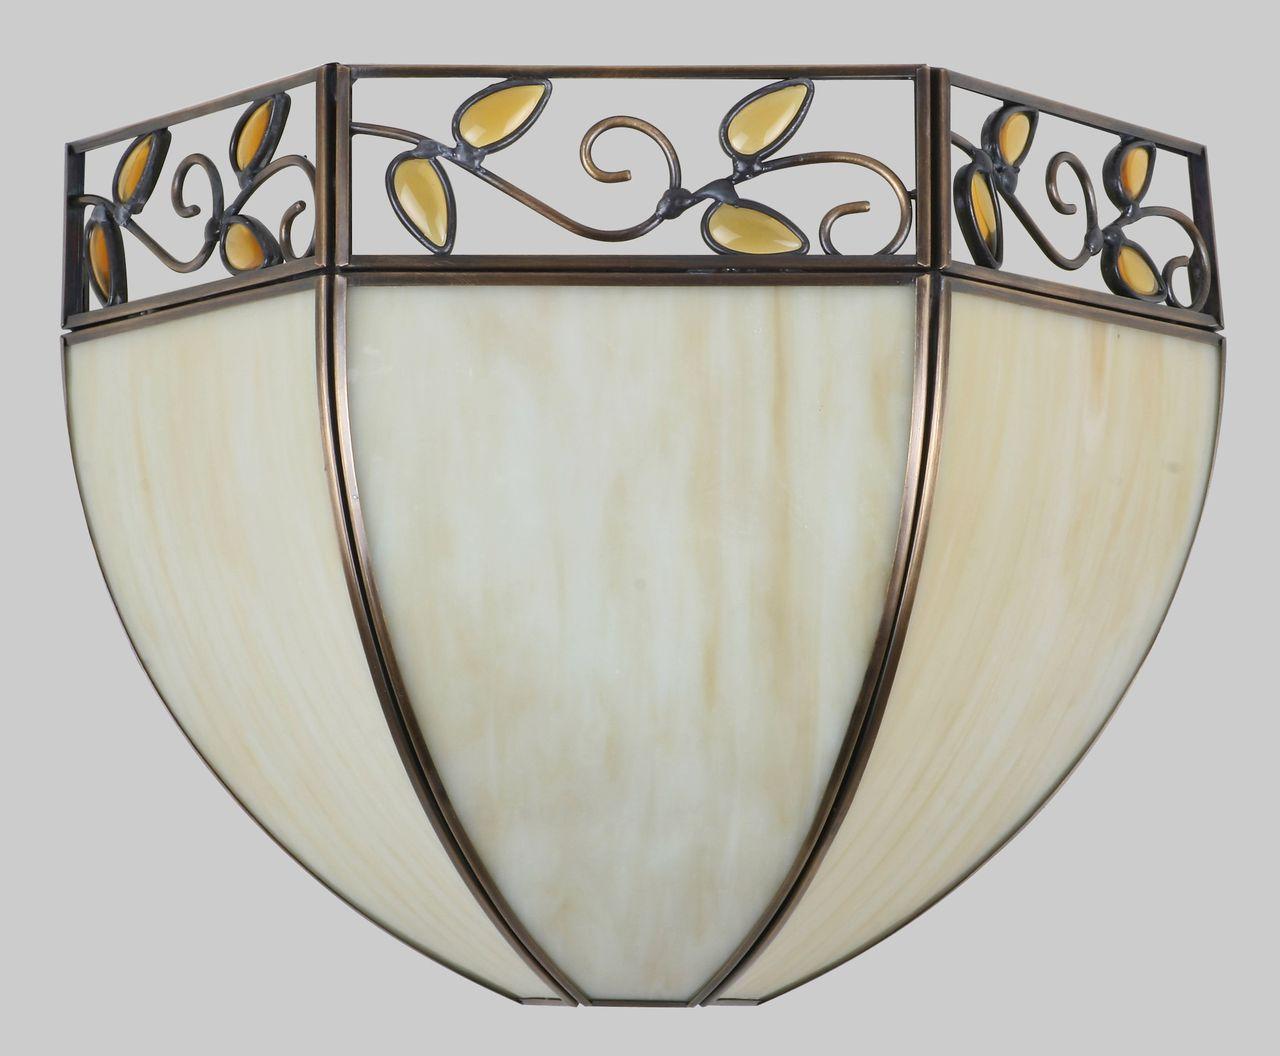 Настенный светильник Citilux Шербург-2 CL440411 бра citilux шербург cl440411